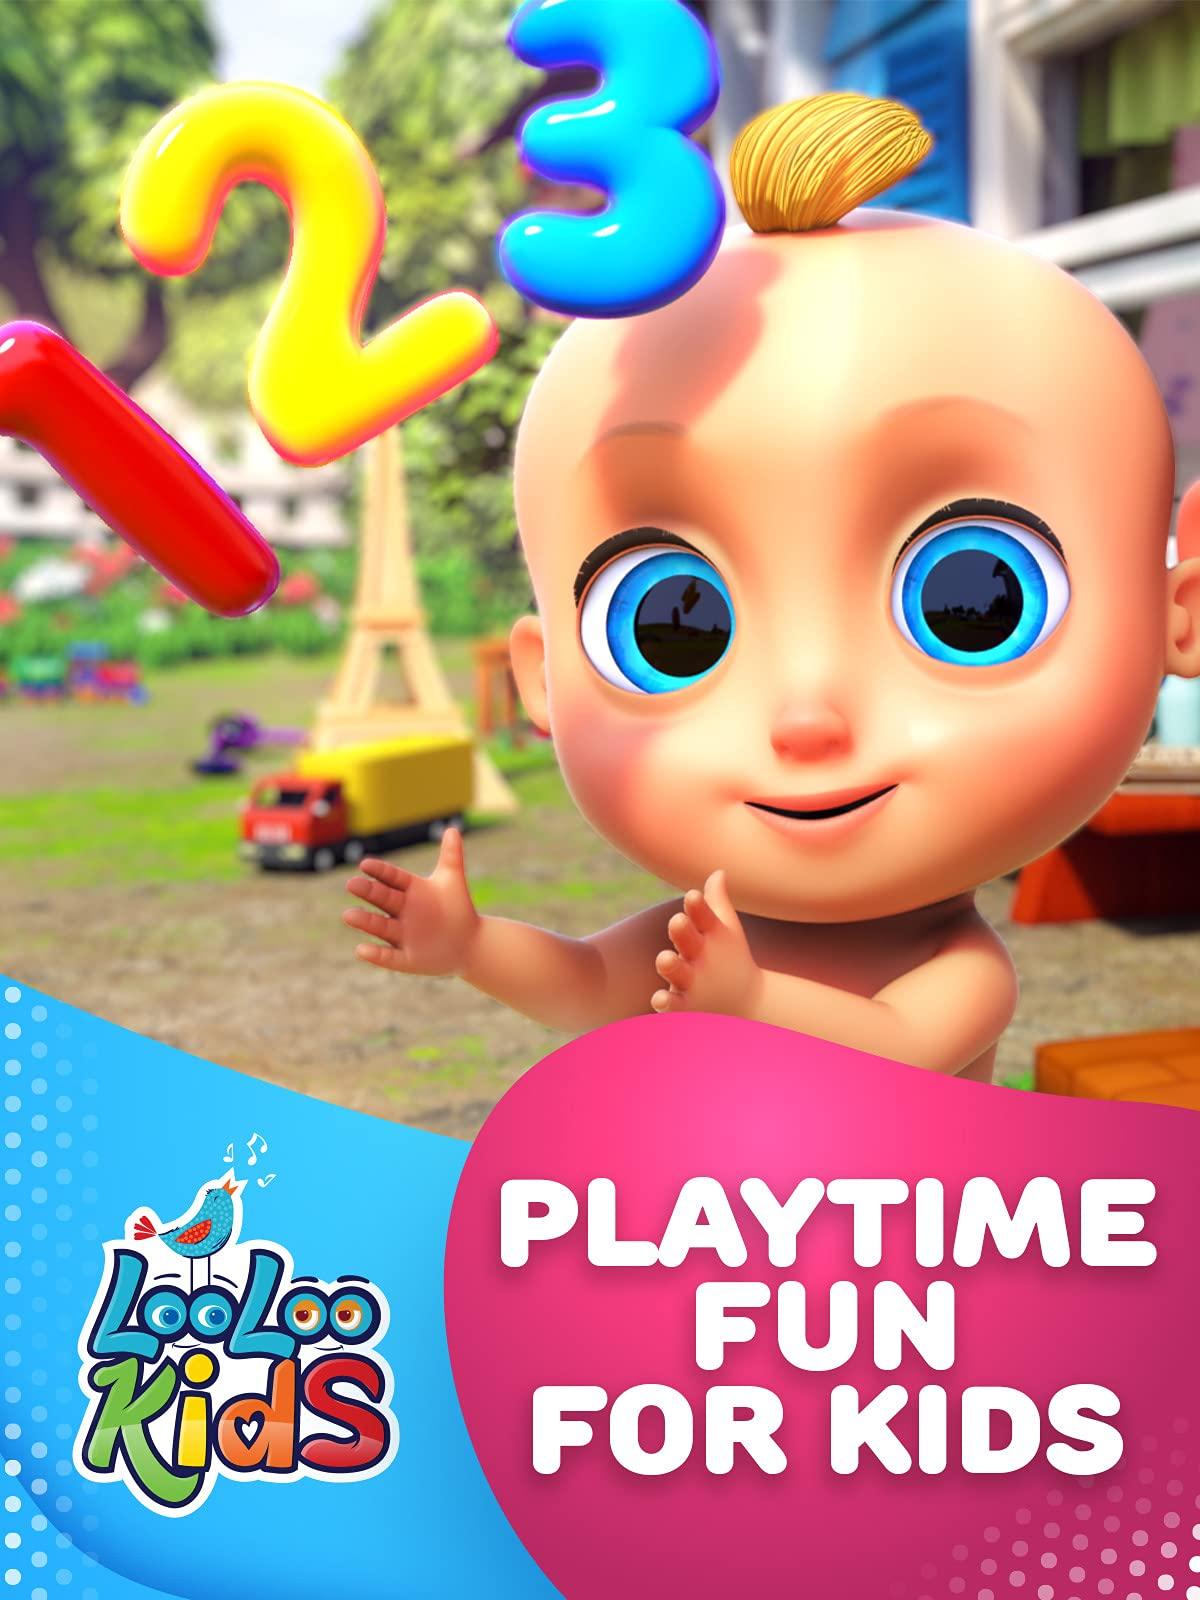 Playtime Fun for Kids - LooLoo Kids